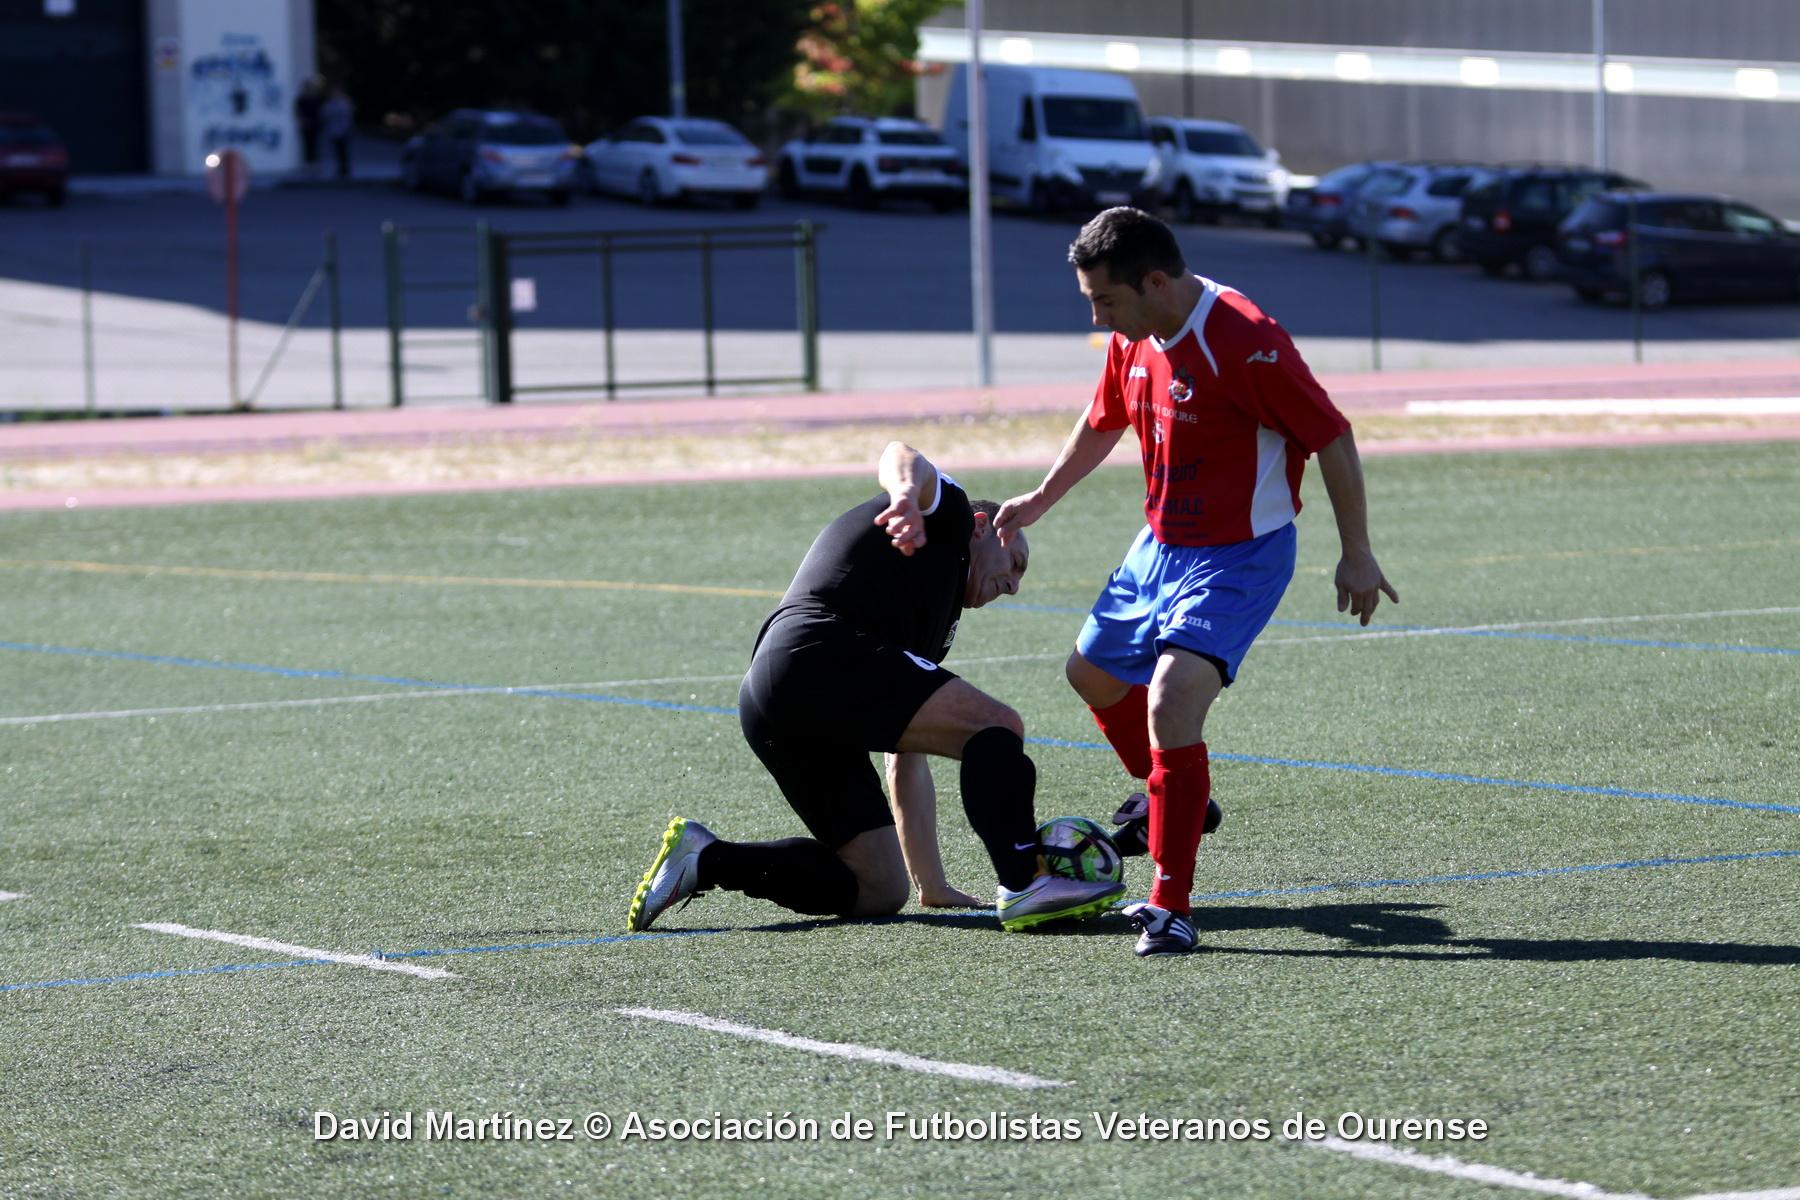 Futbol_Veteranos_Foto_DavidMartinez_05